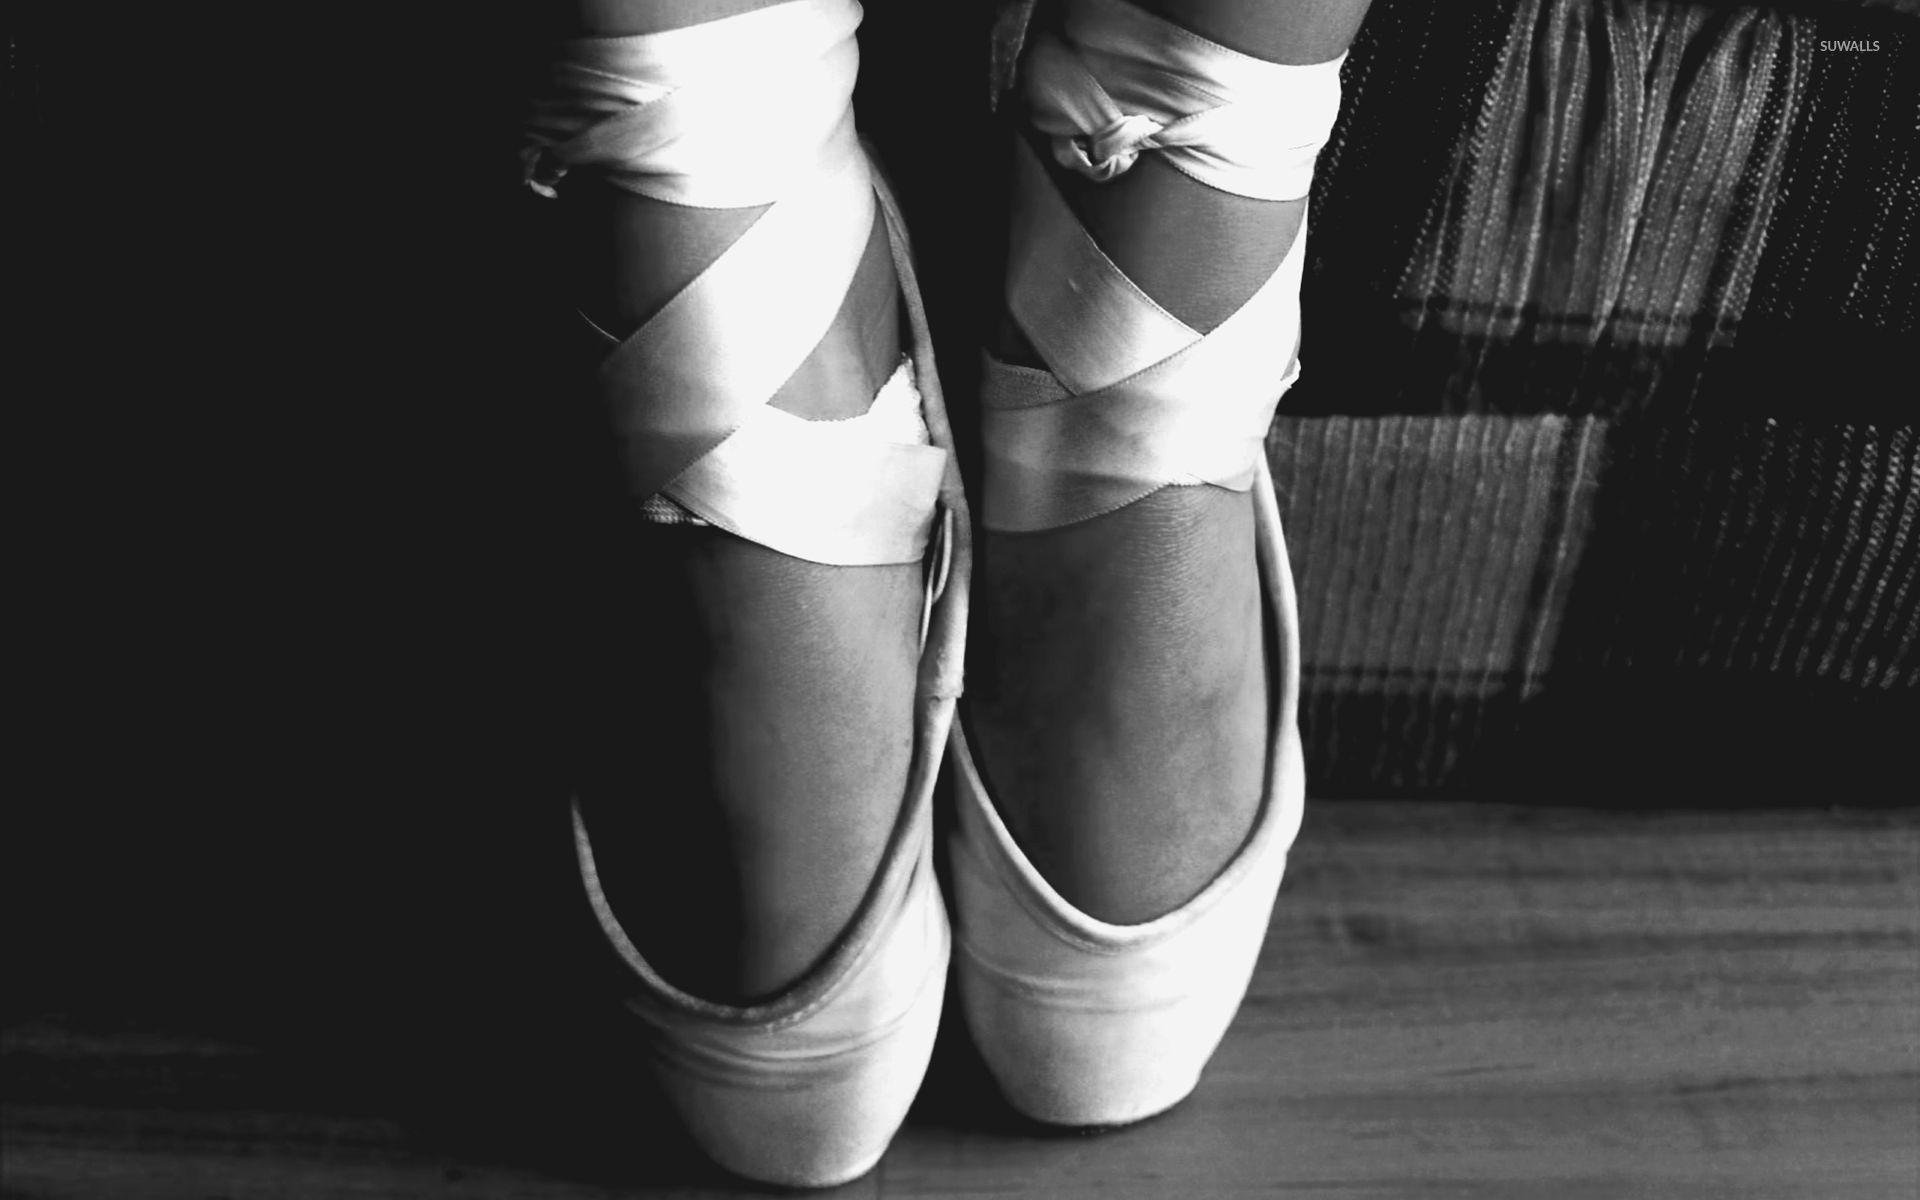 Ballet shoes 2 wallpaper photography wallpapers 27969 ballet shoes 2 wallpaper voltagebd Images